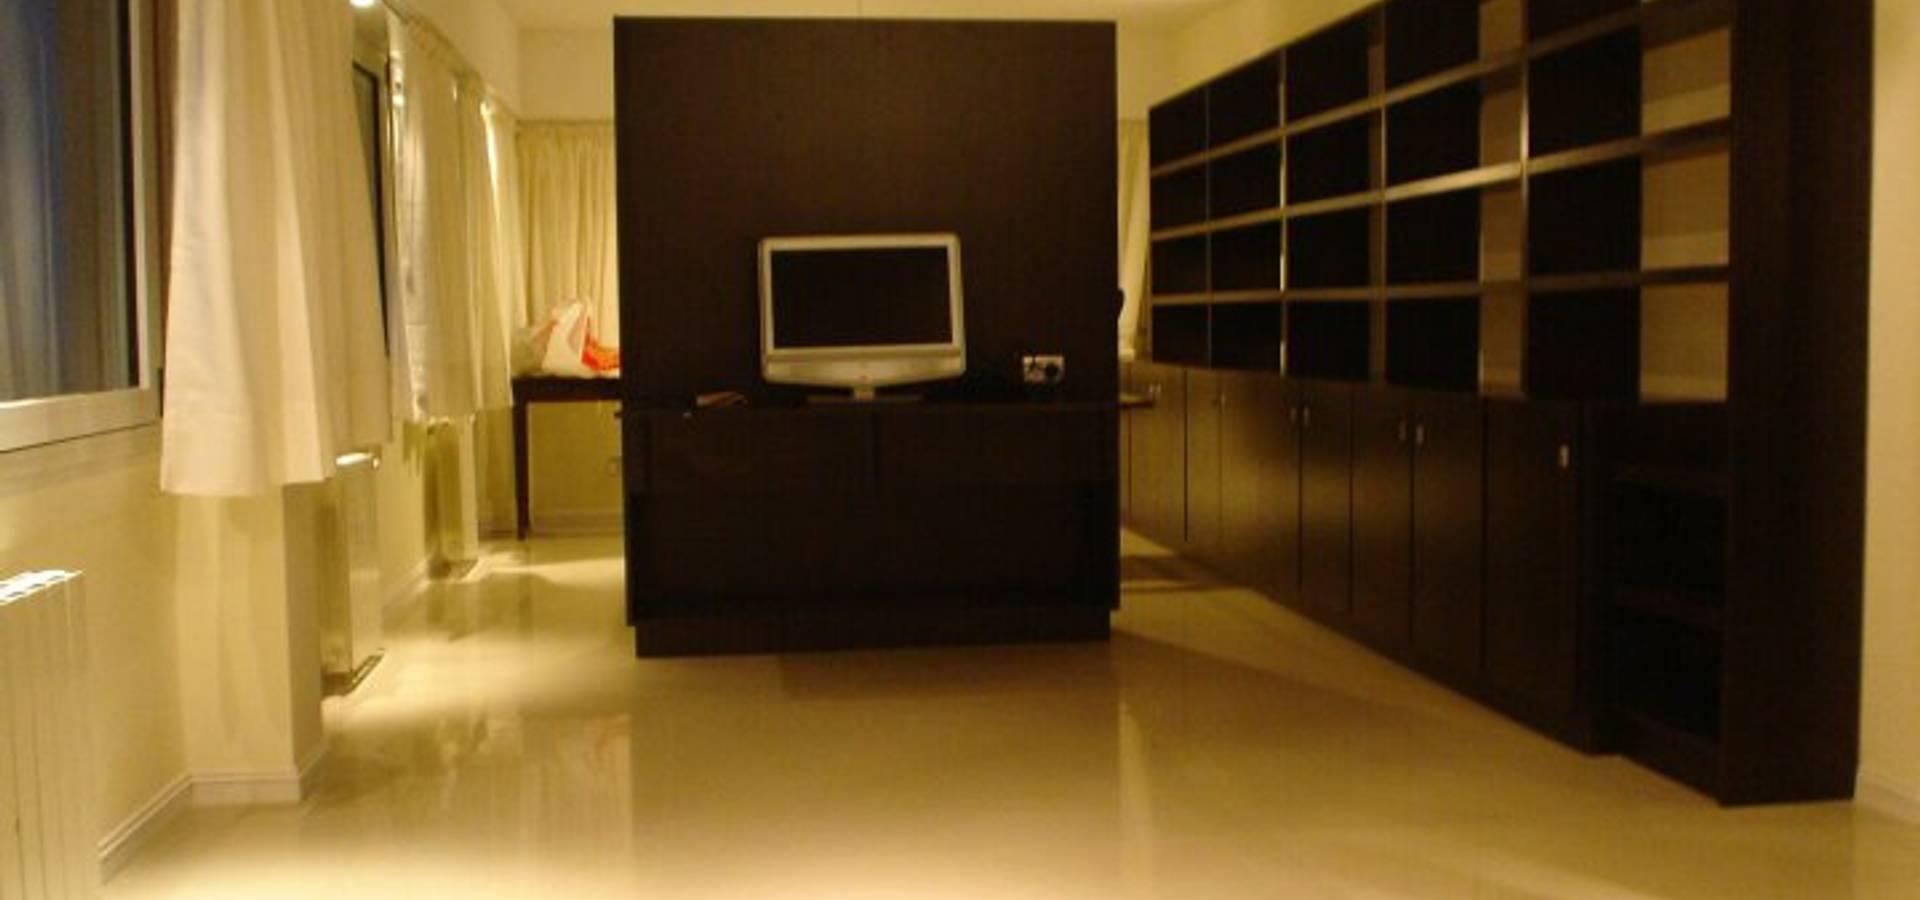 ArqmdP—Arquitectura + Diseño